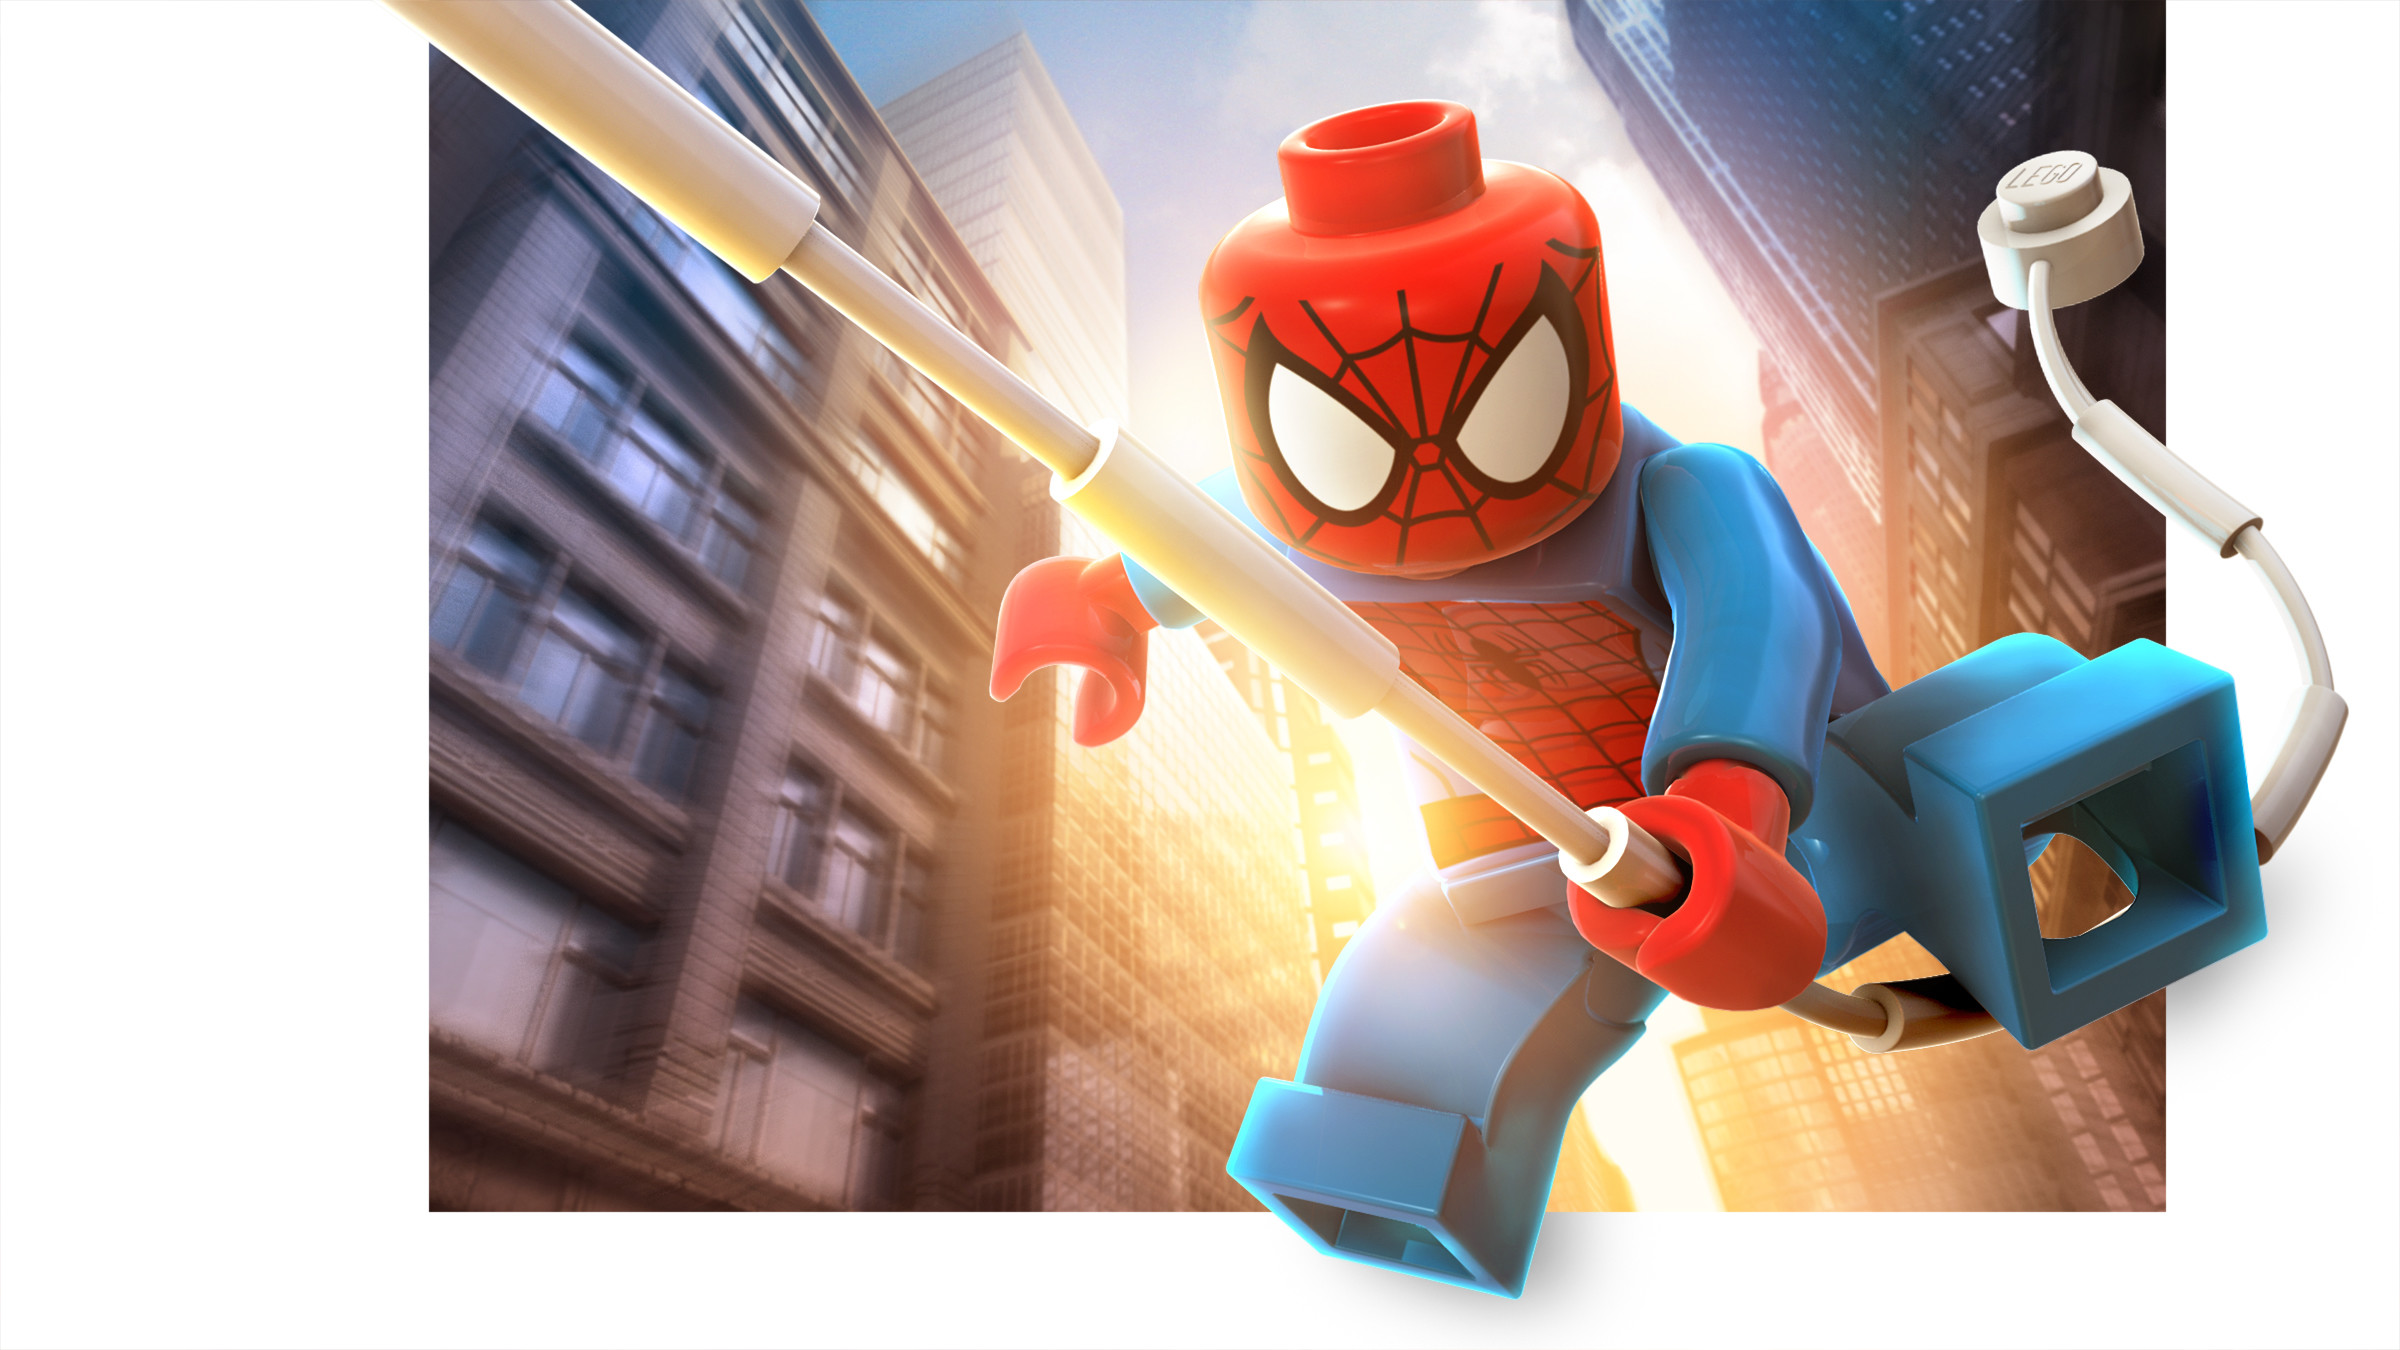 Res: 2400x1350, Spider Man LEGO Marvel Super Heroes Render Just Push Start